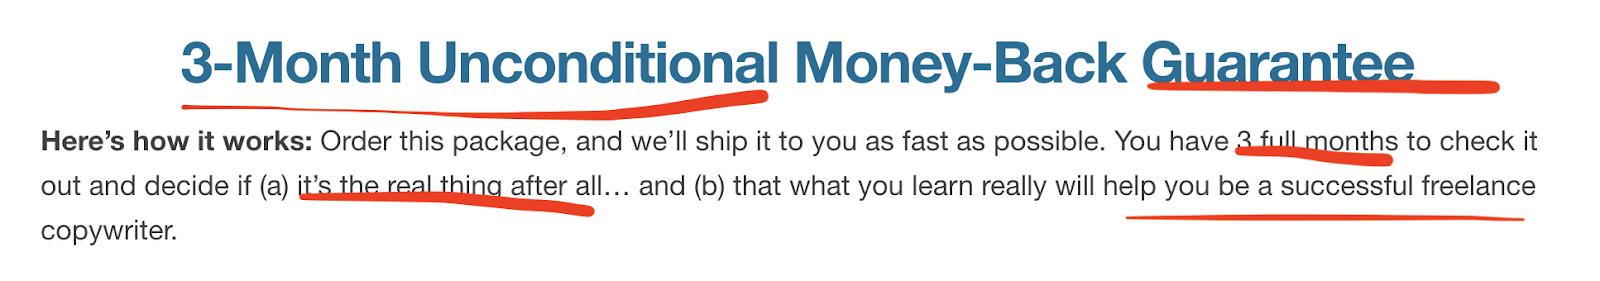 money-back-guarantee-90-days